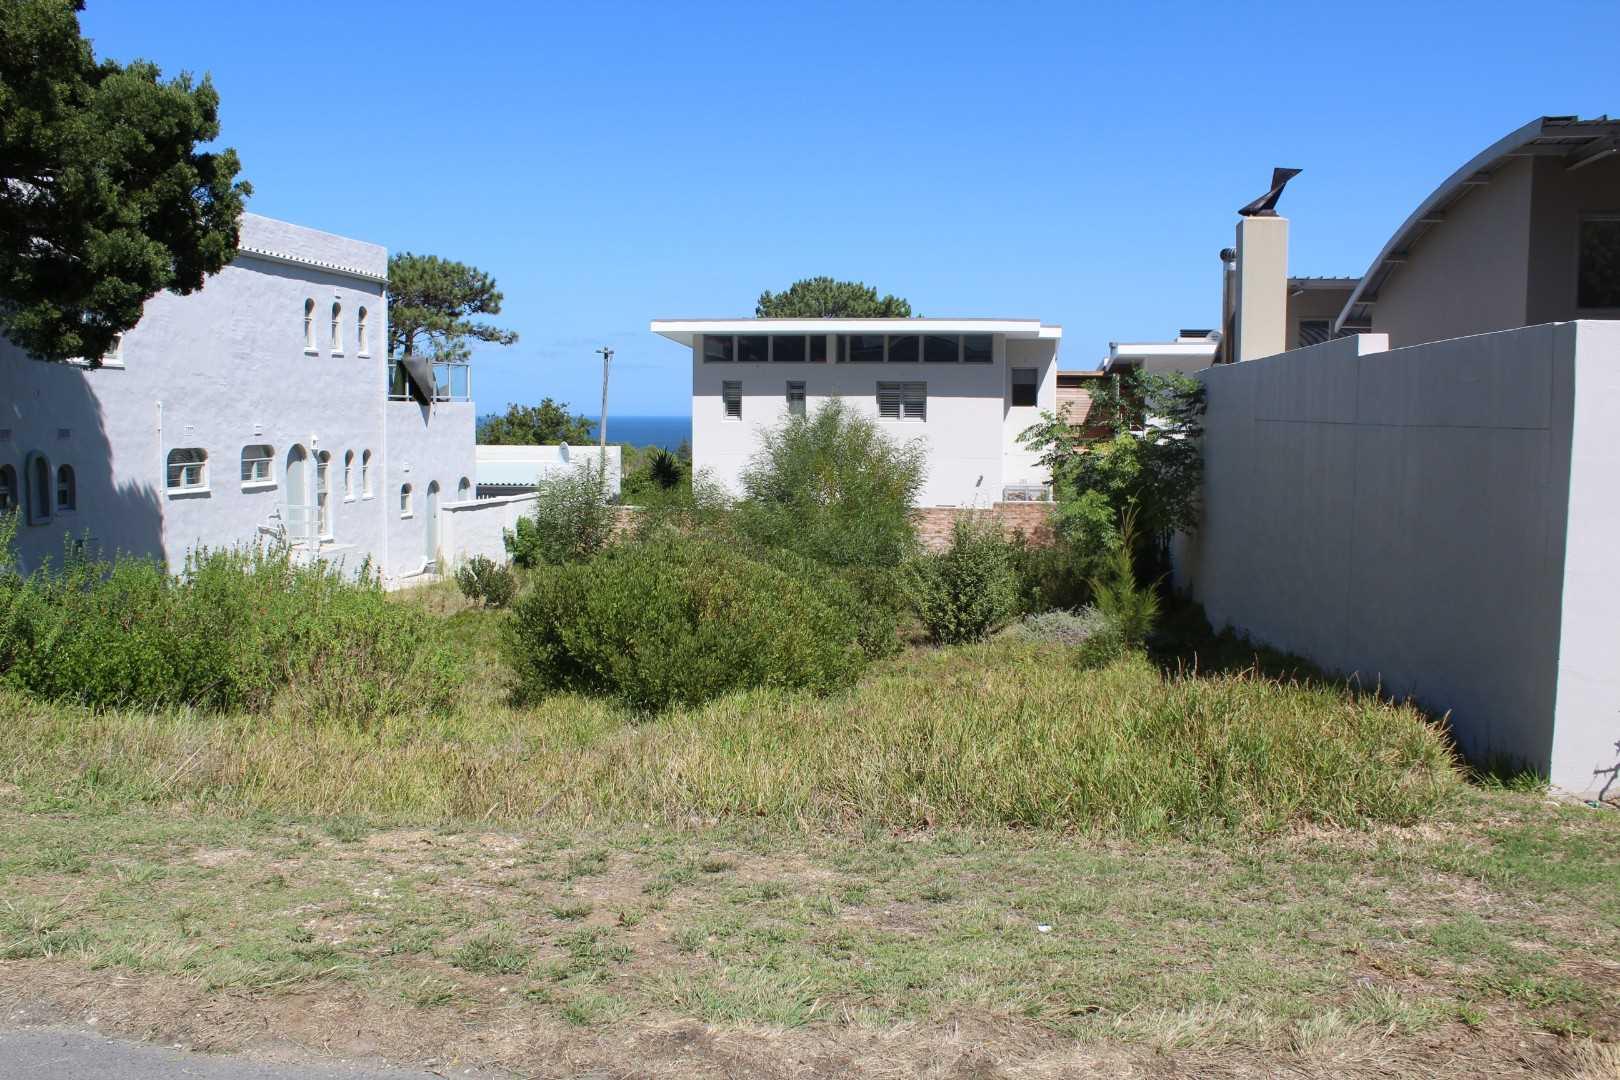 Vacant land / plot for sale in Voëlklip, Hermanus